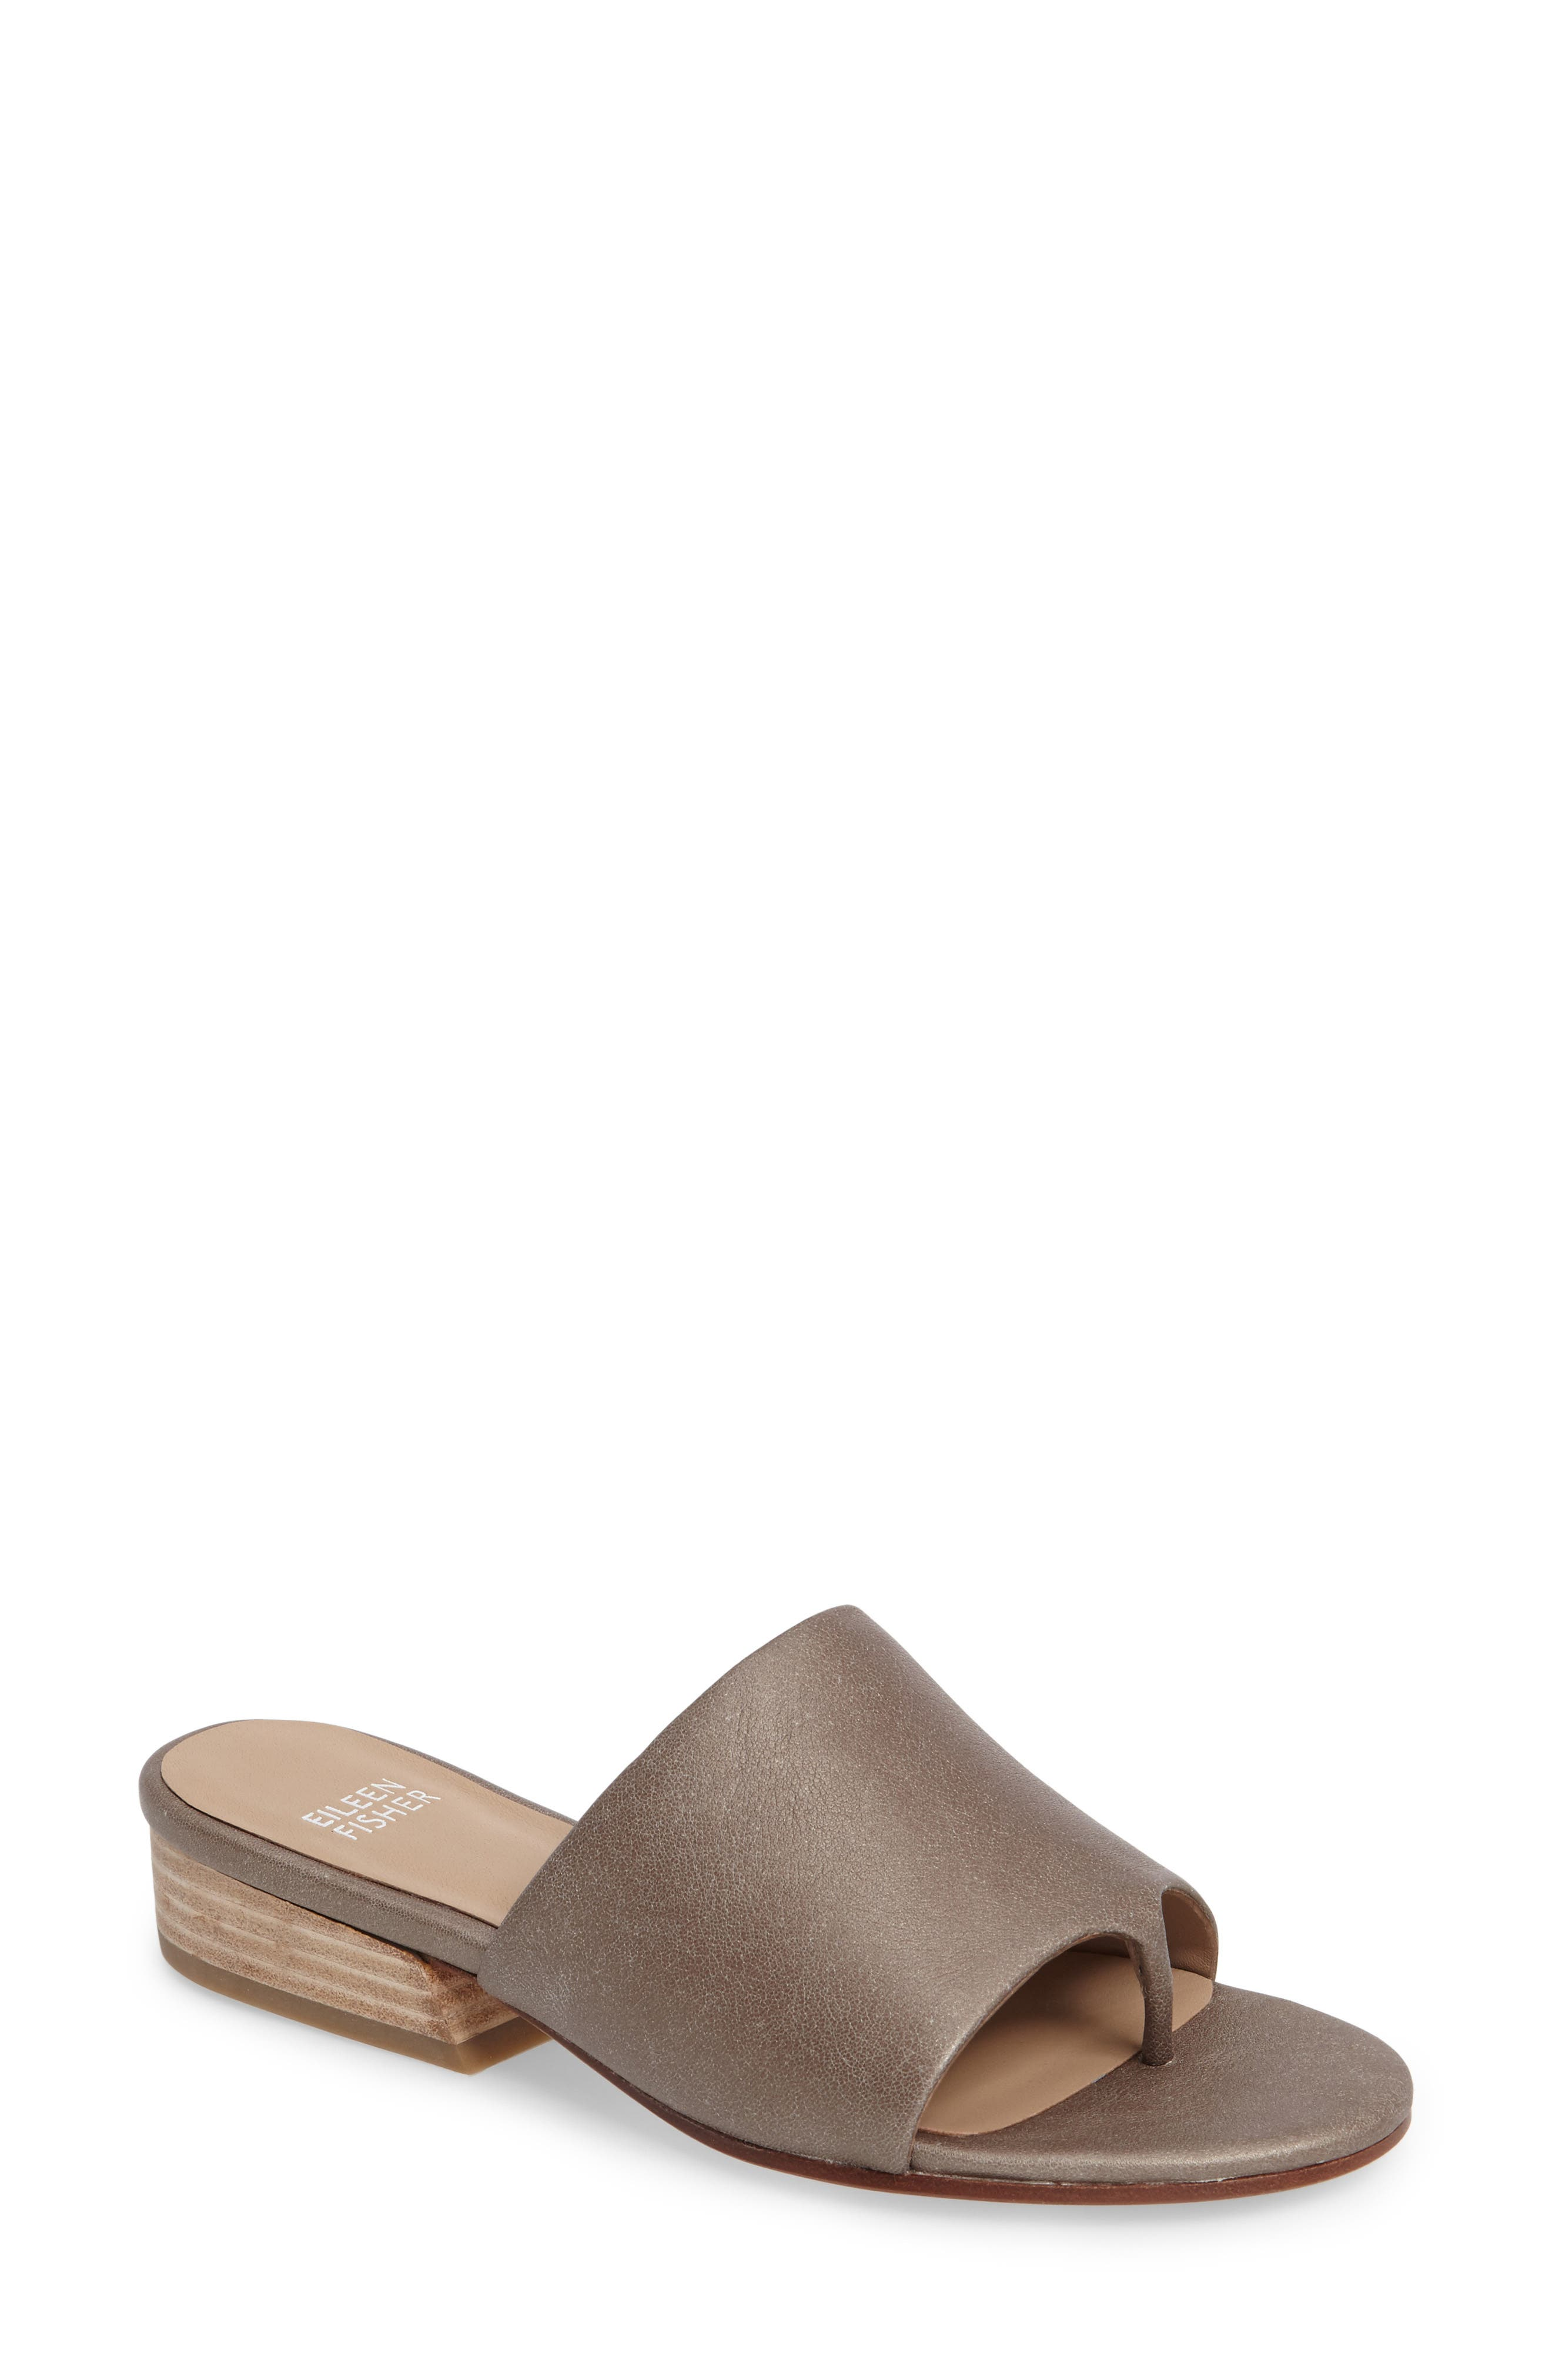 Beal Slide Sandal,                             Main thumbnail 1, color,                             Pyrite Leather